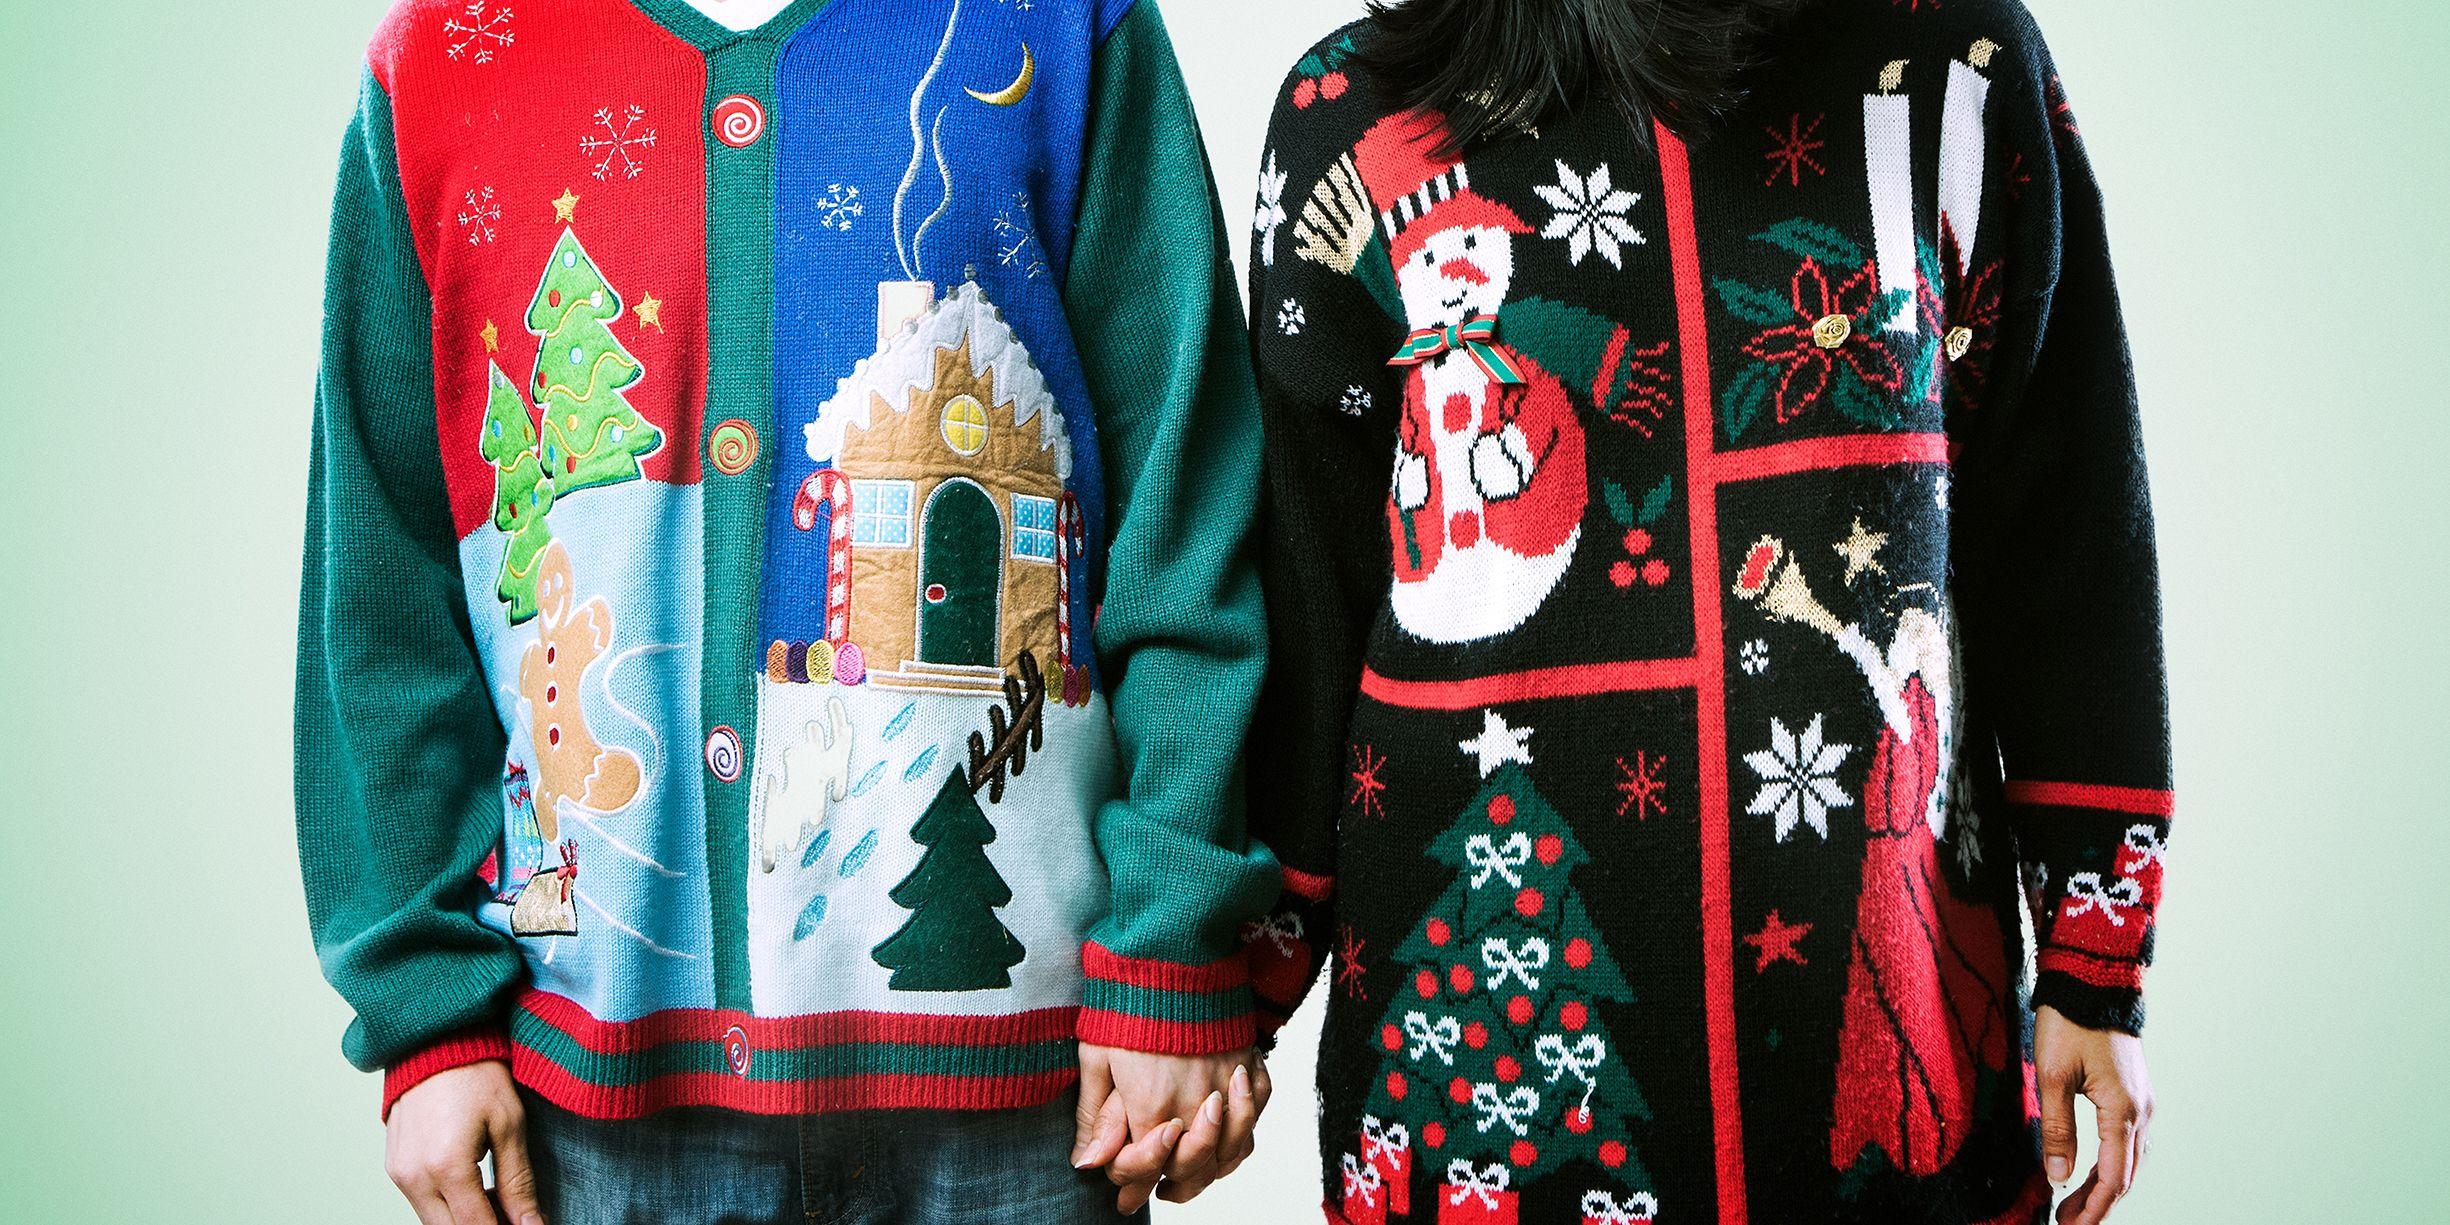 4334362c67 28 Fun Christmas Activities - Christmas Bucket List Ideas - Country Living